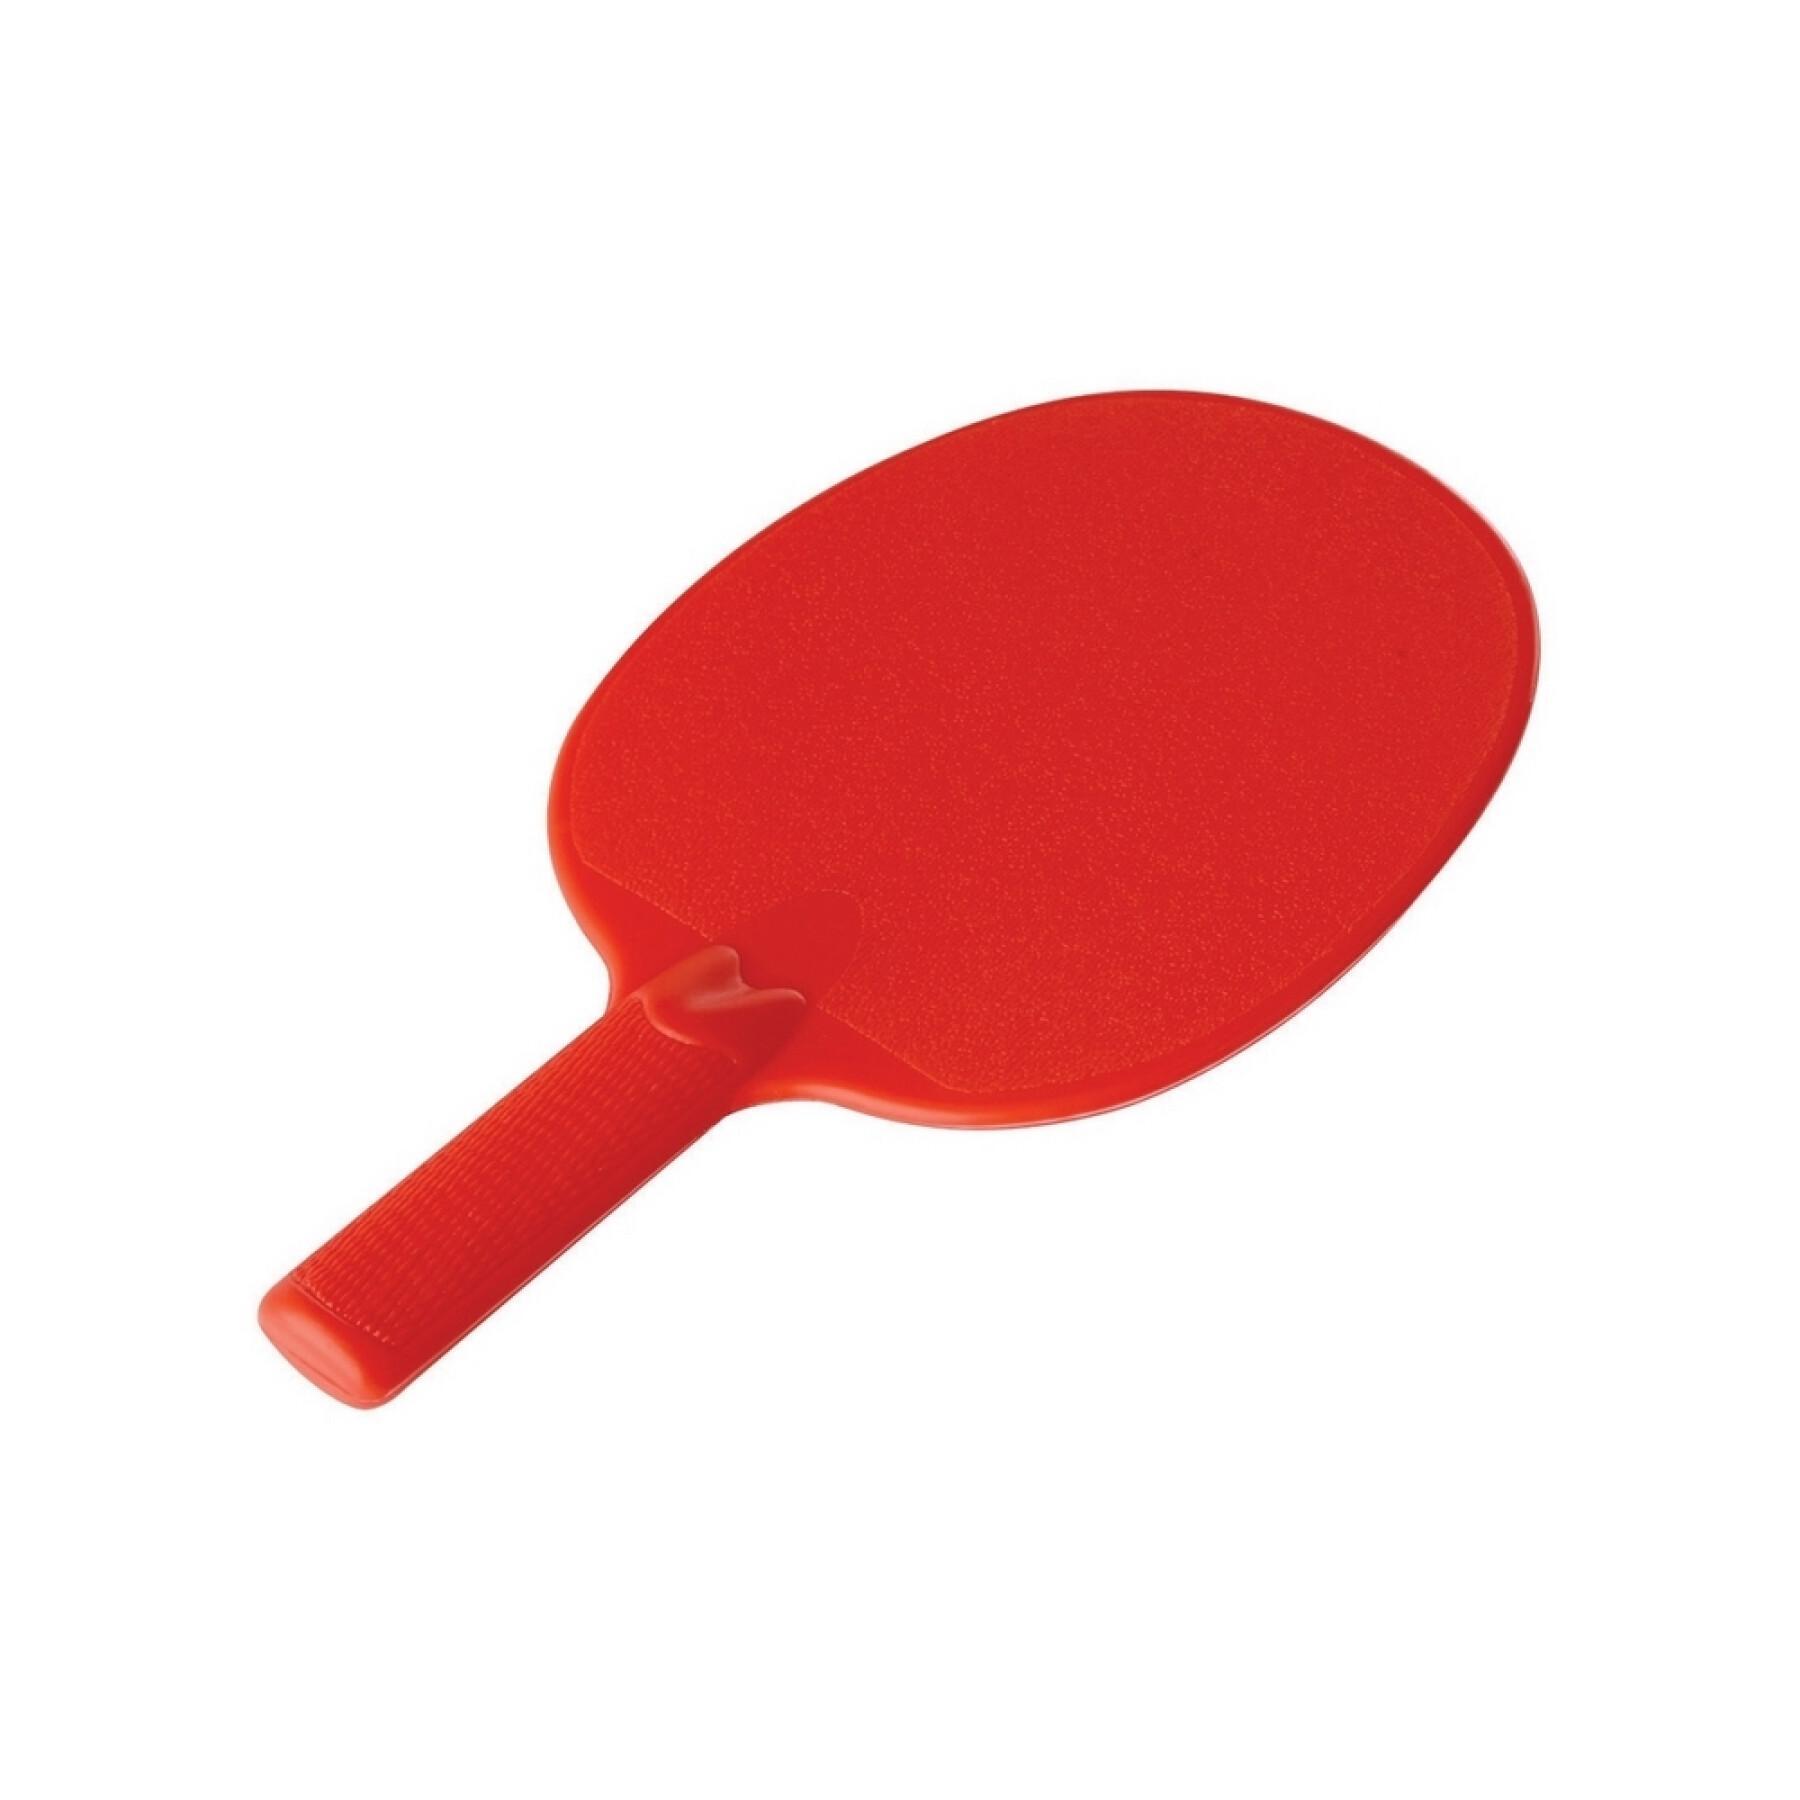 Tremblay initiation table tennis racket